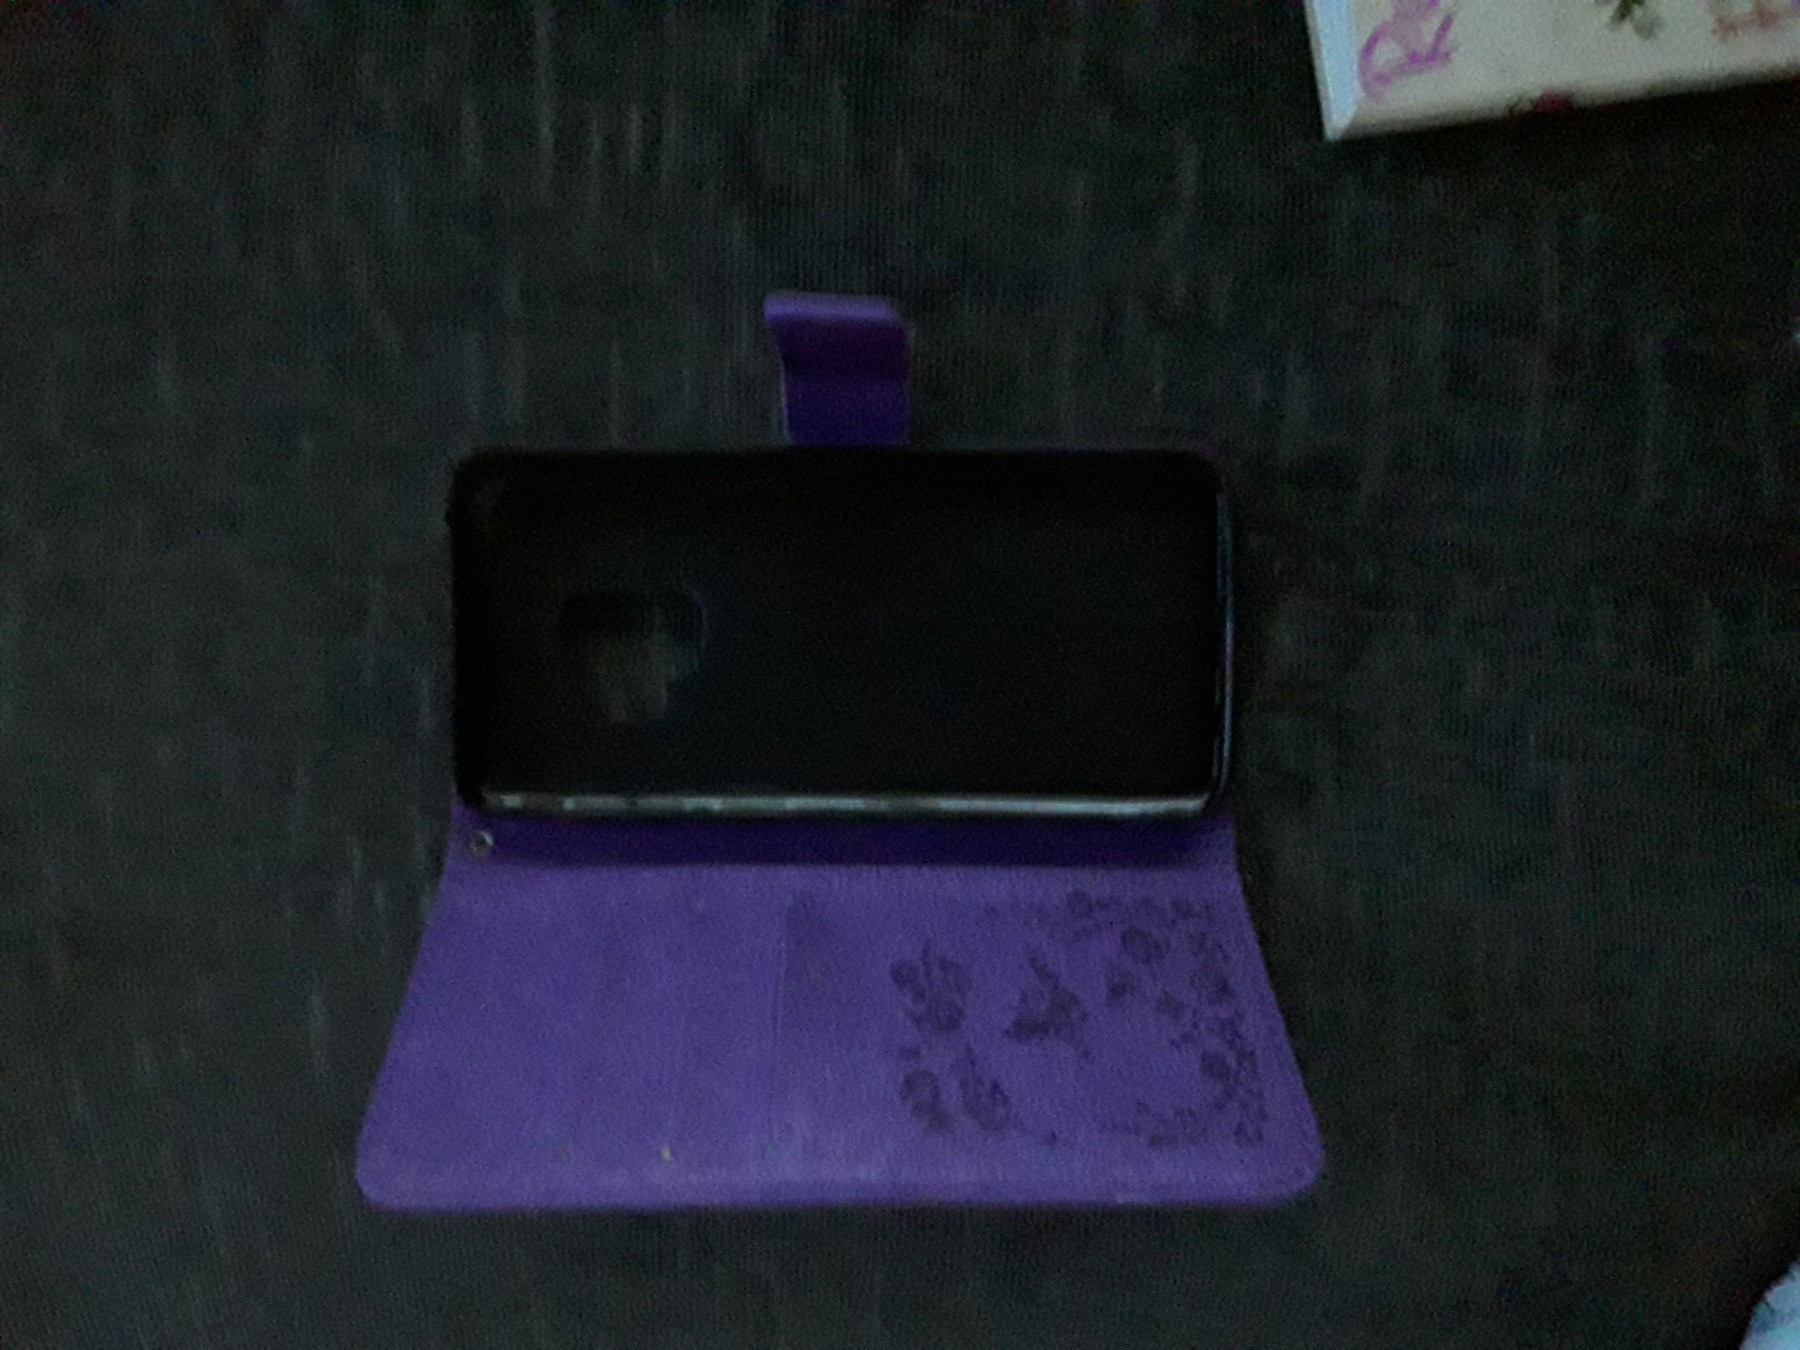 Samsung phone case stockproof